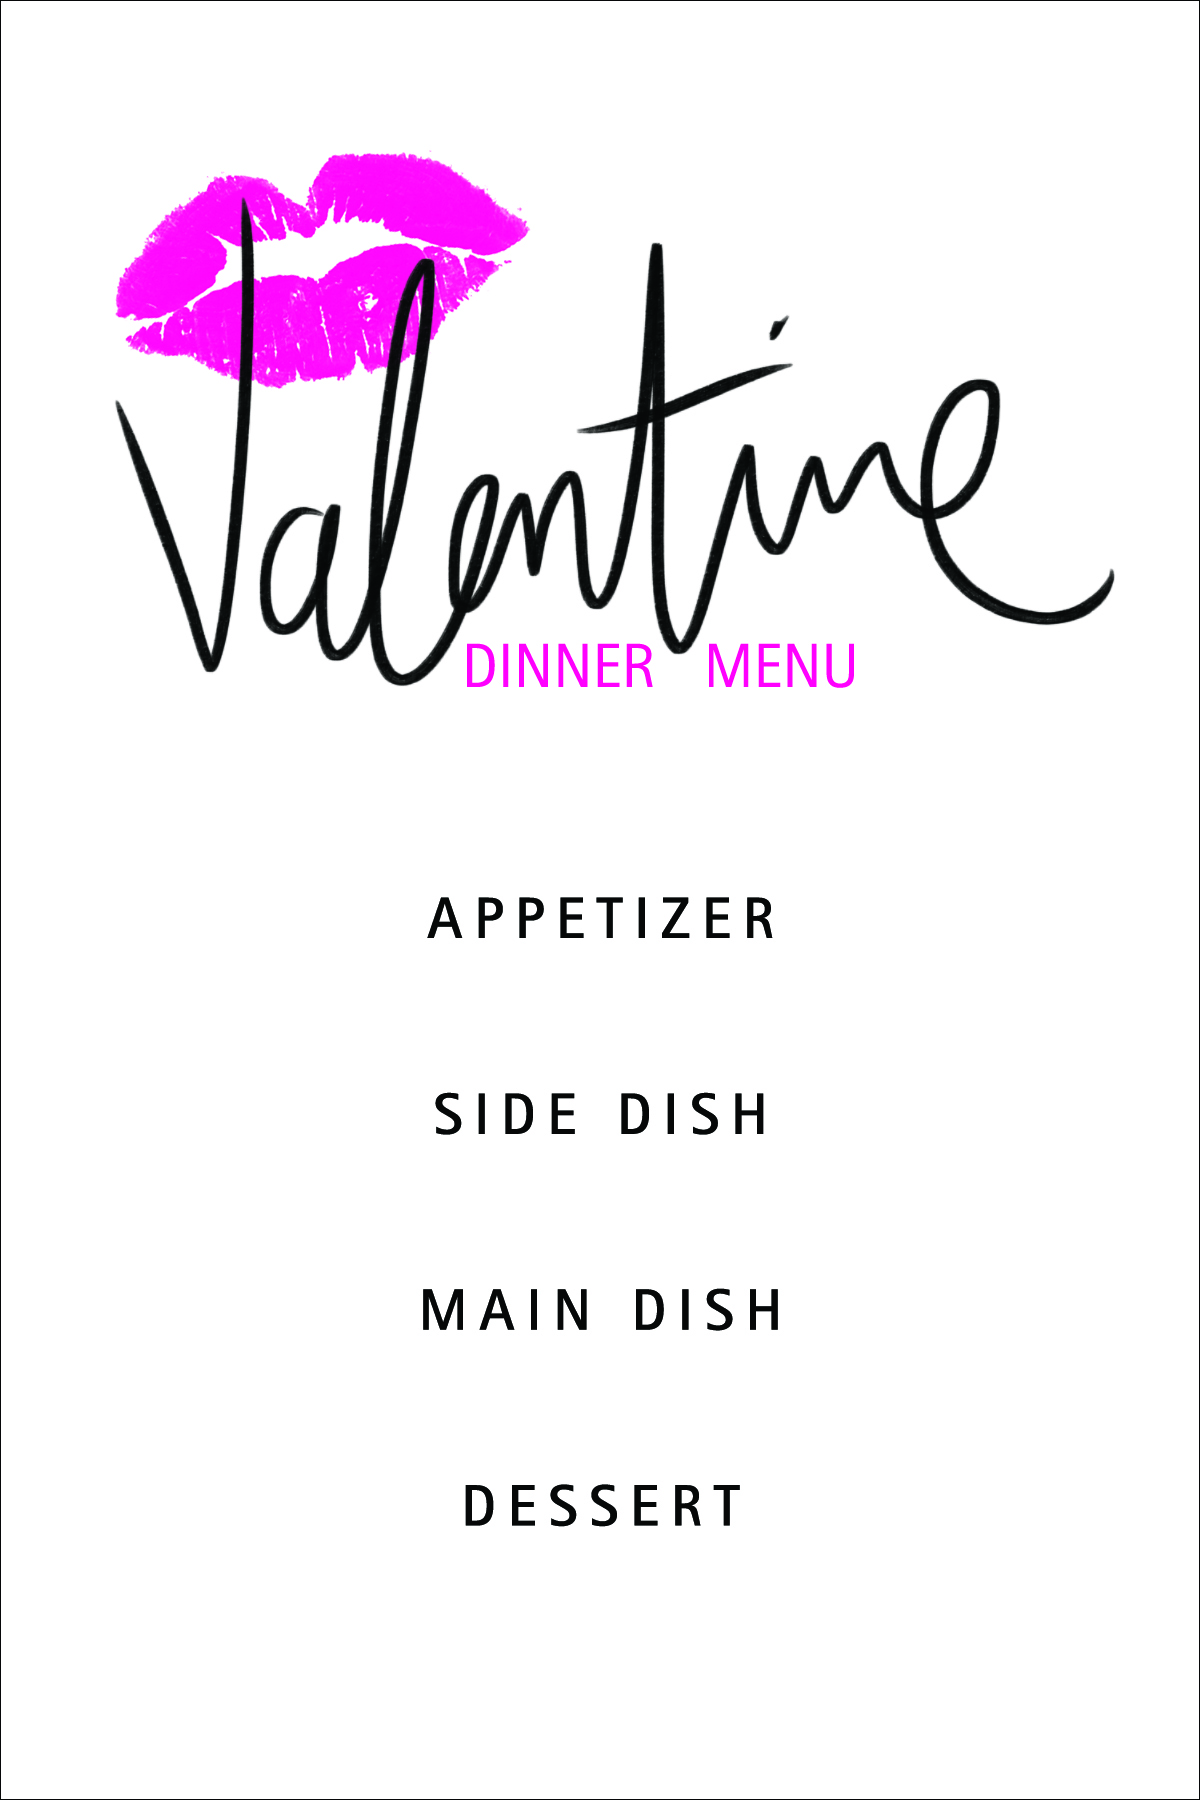 Download your free valentine 39 s day dinner menu here for Romantic valentine dinner menu ideas